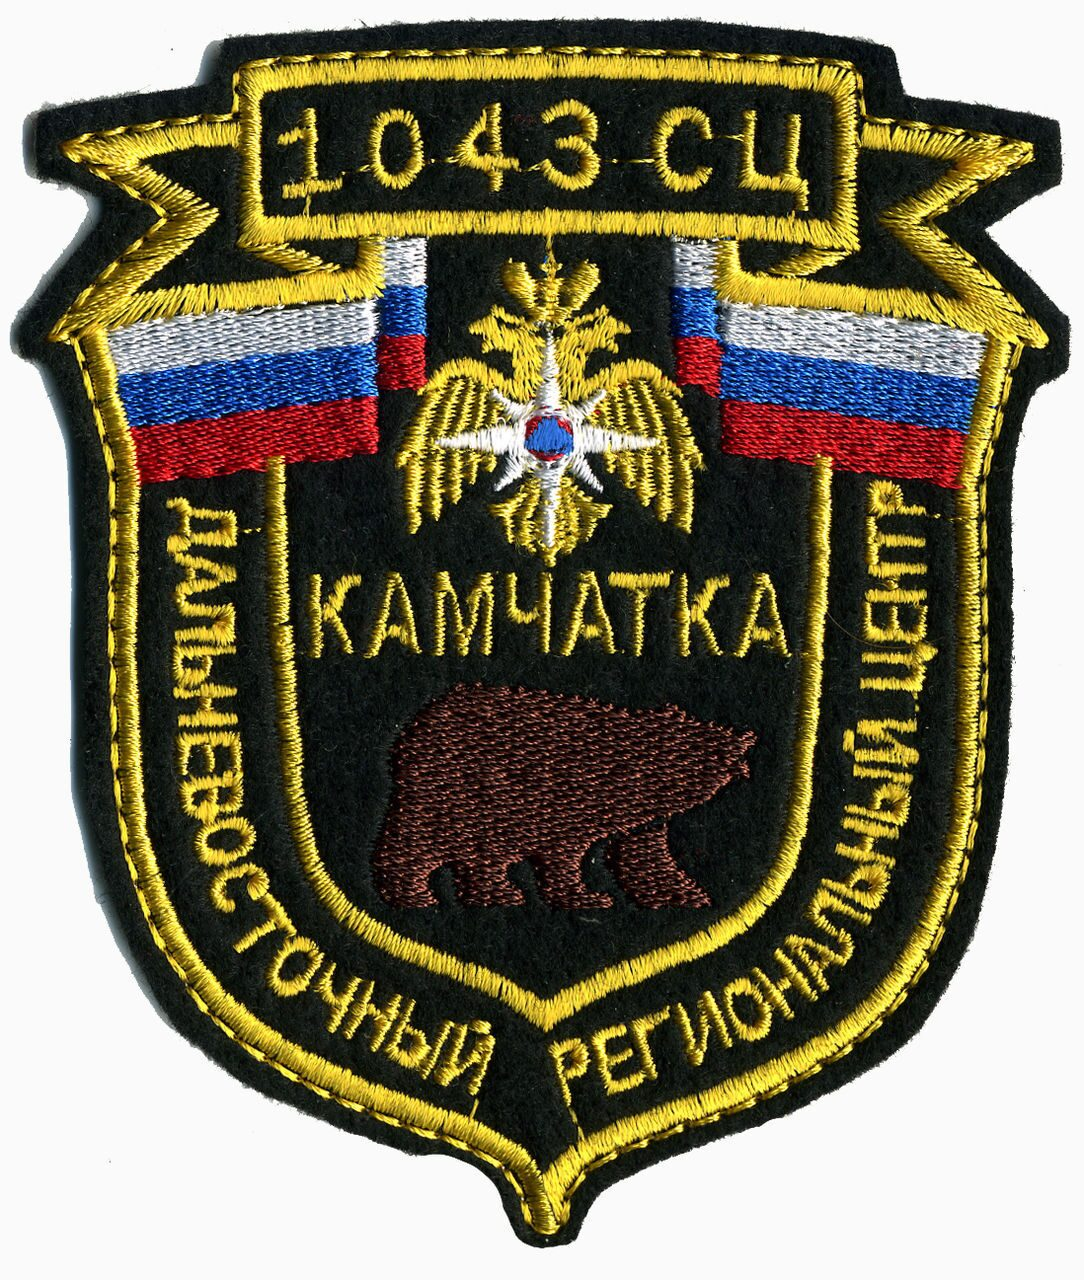 ДВ РЦ 1043 СЦ КАМЧАТКА